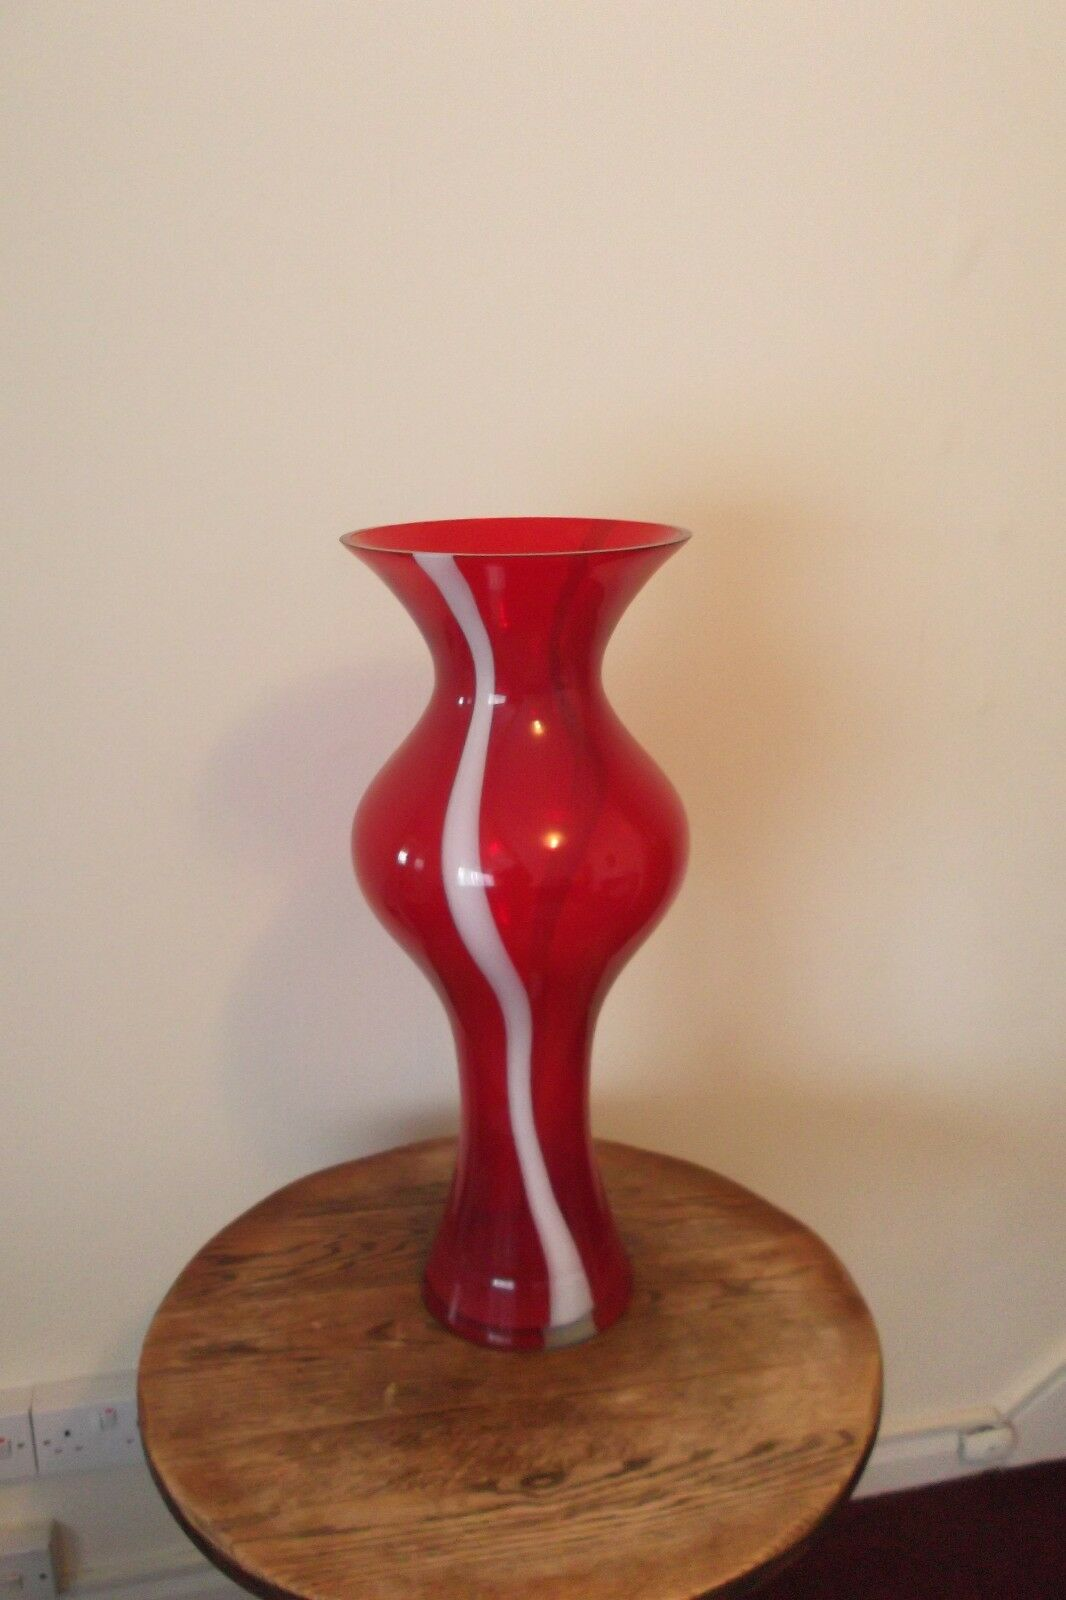 Makora 60 vase, soufflé/art glass, 60 Makora cm Tall 57647d